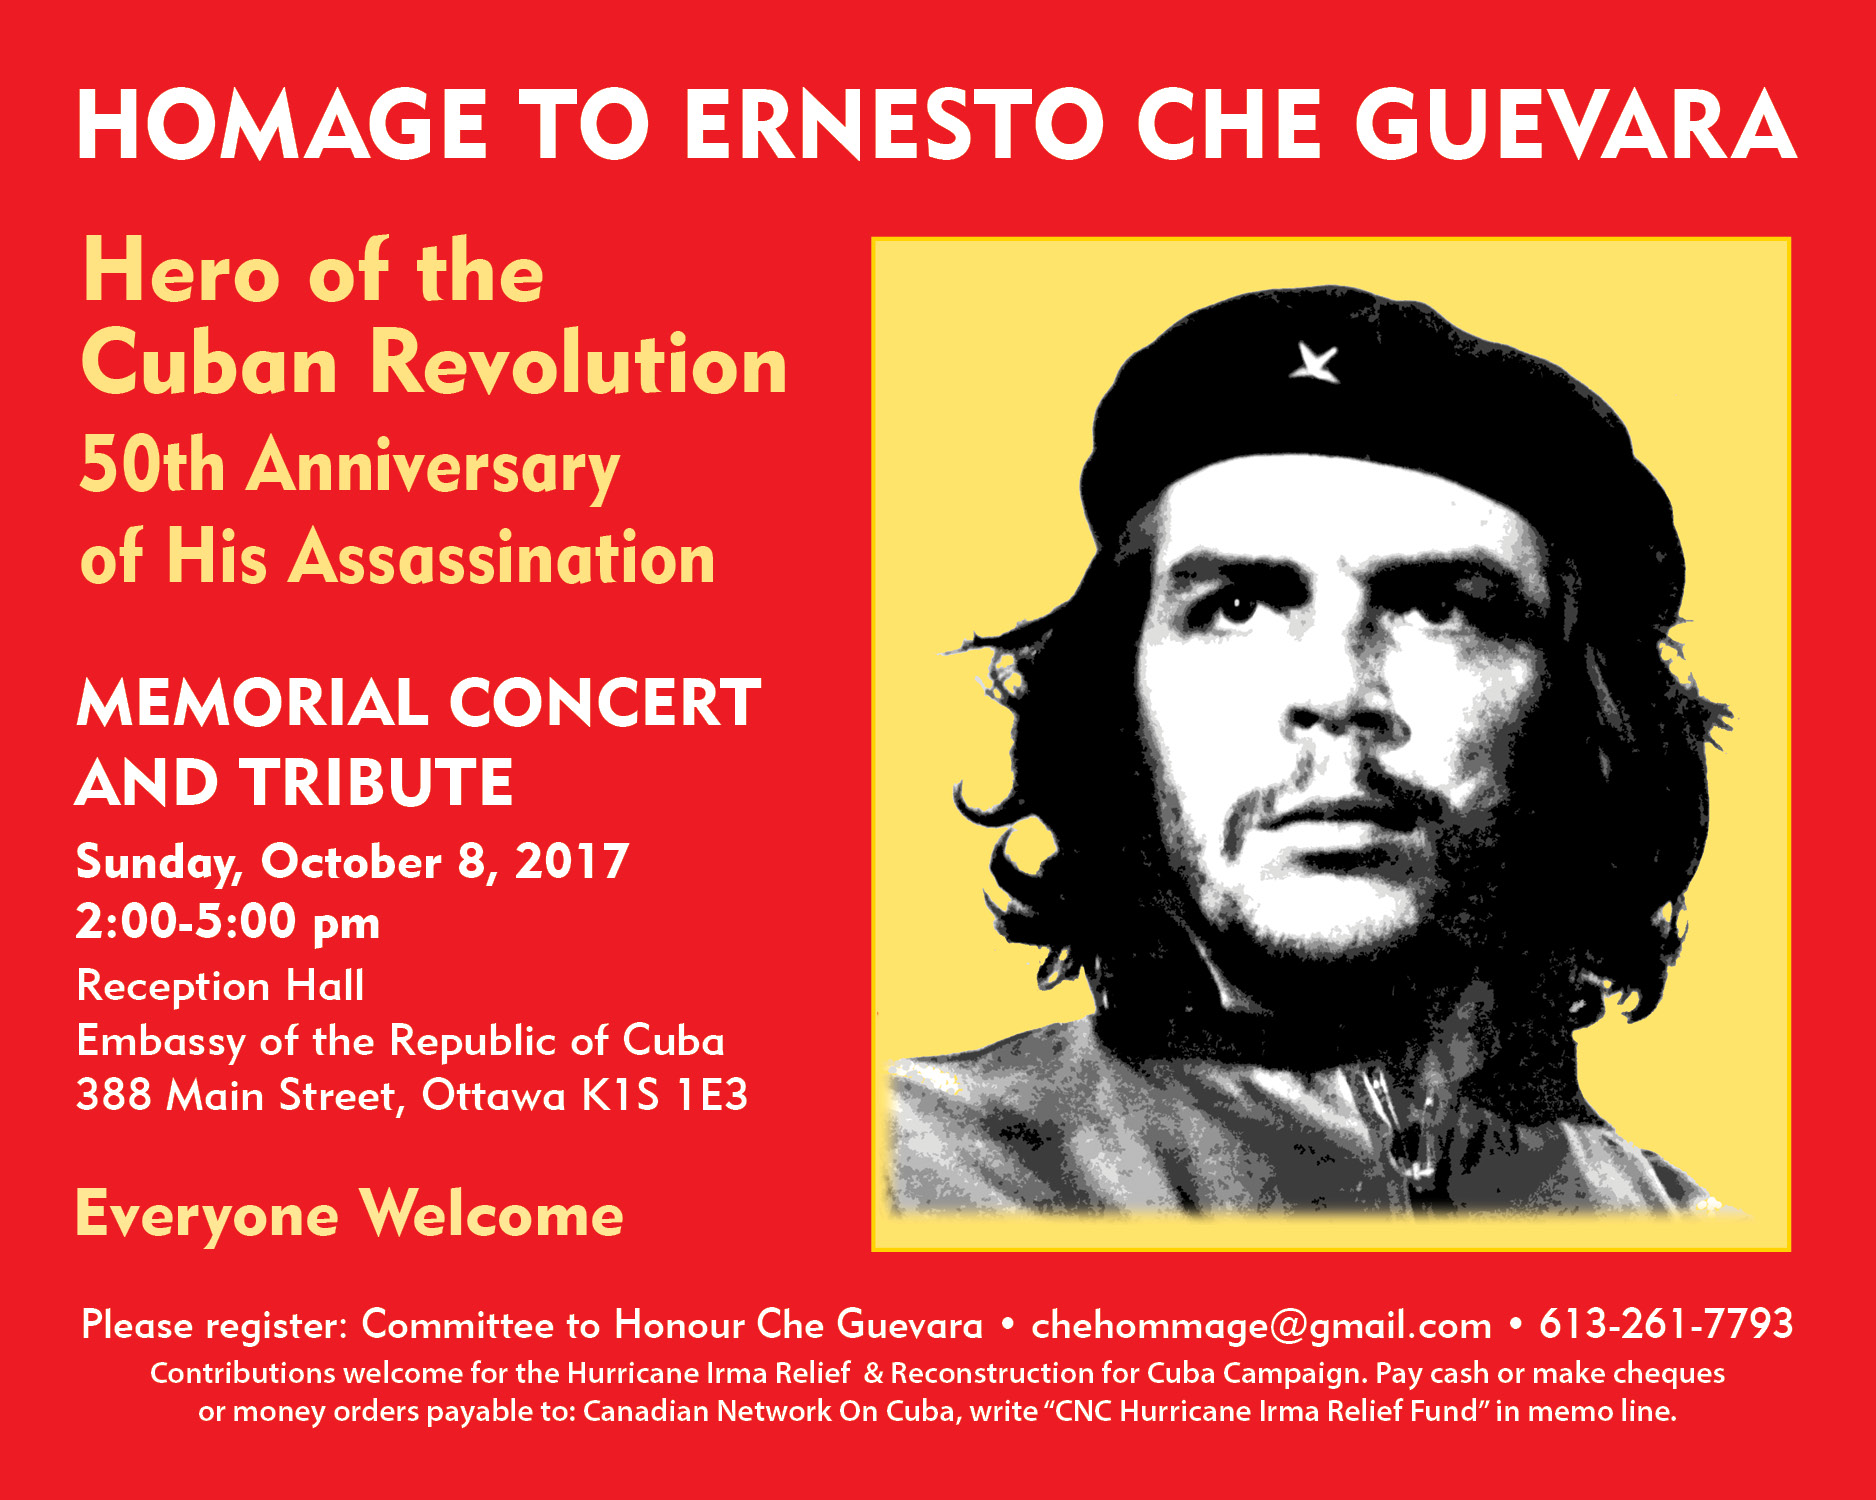 a biography of ernesto guevara de la serna the argentine marxist revolutionary Guevara the revolutionary is born call me ernesto  born ernesto guevara de la serna, after an argentine father  the marxist strategist used medical.